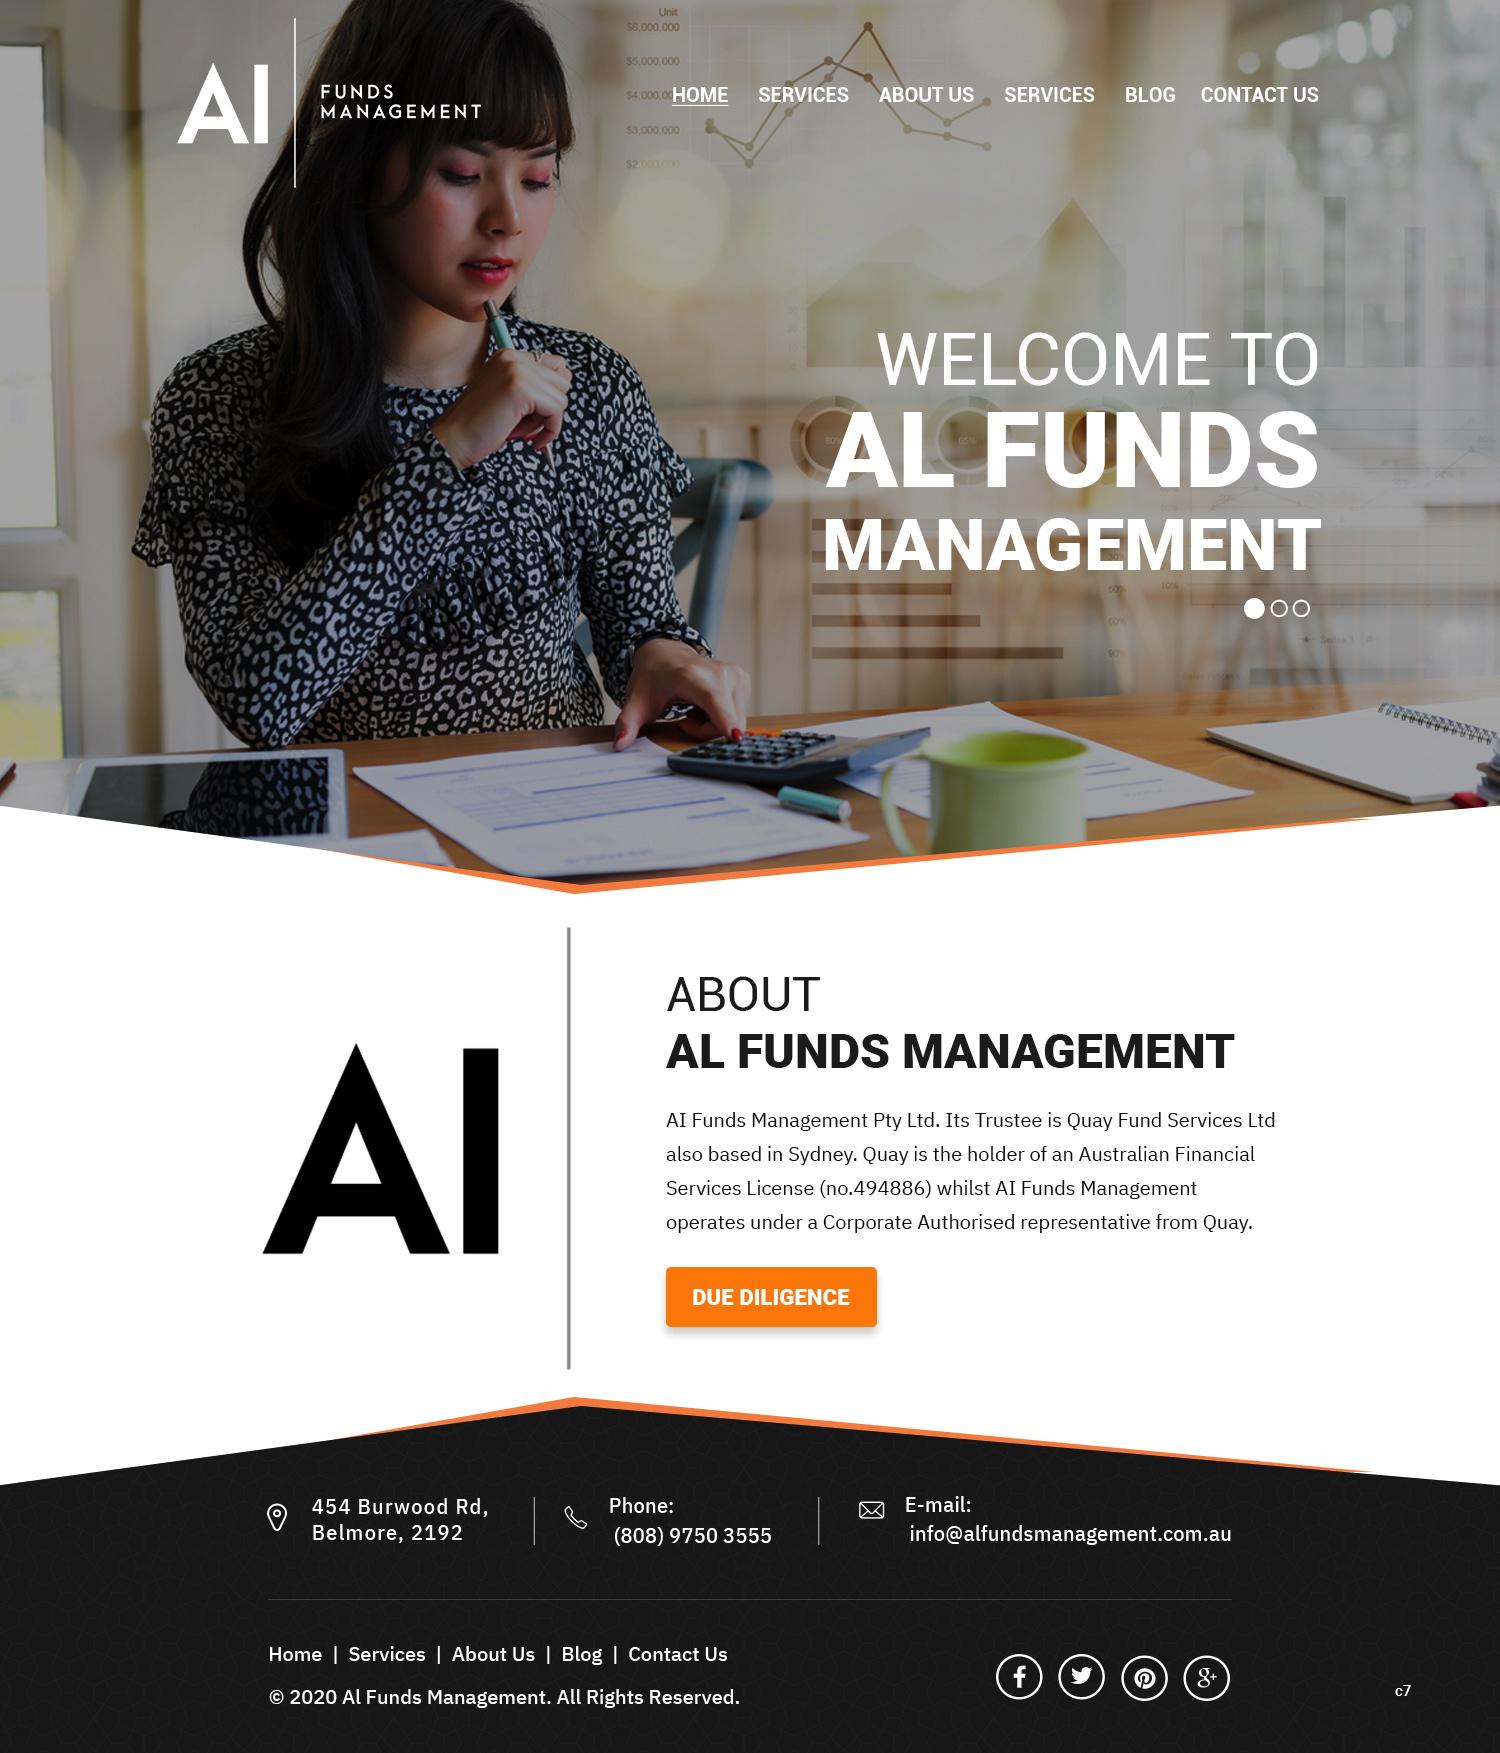 Web Design For A Company By Pb Design 23635073